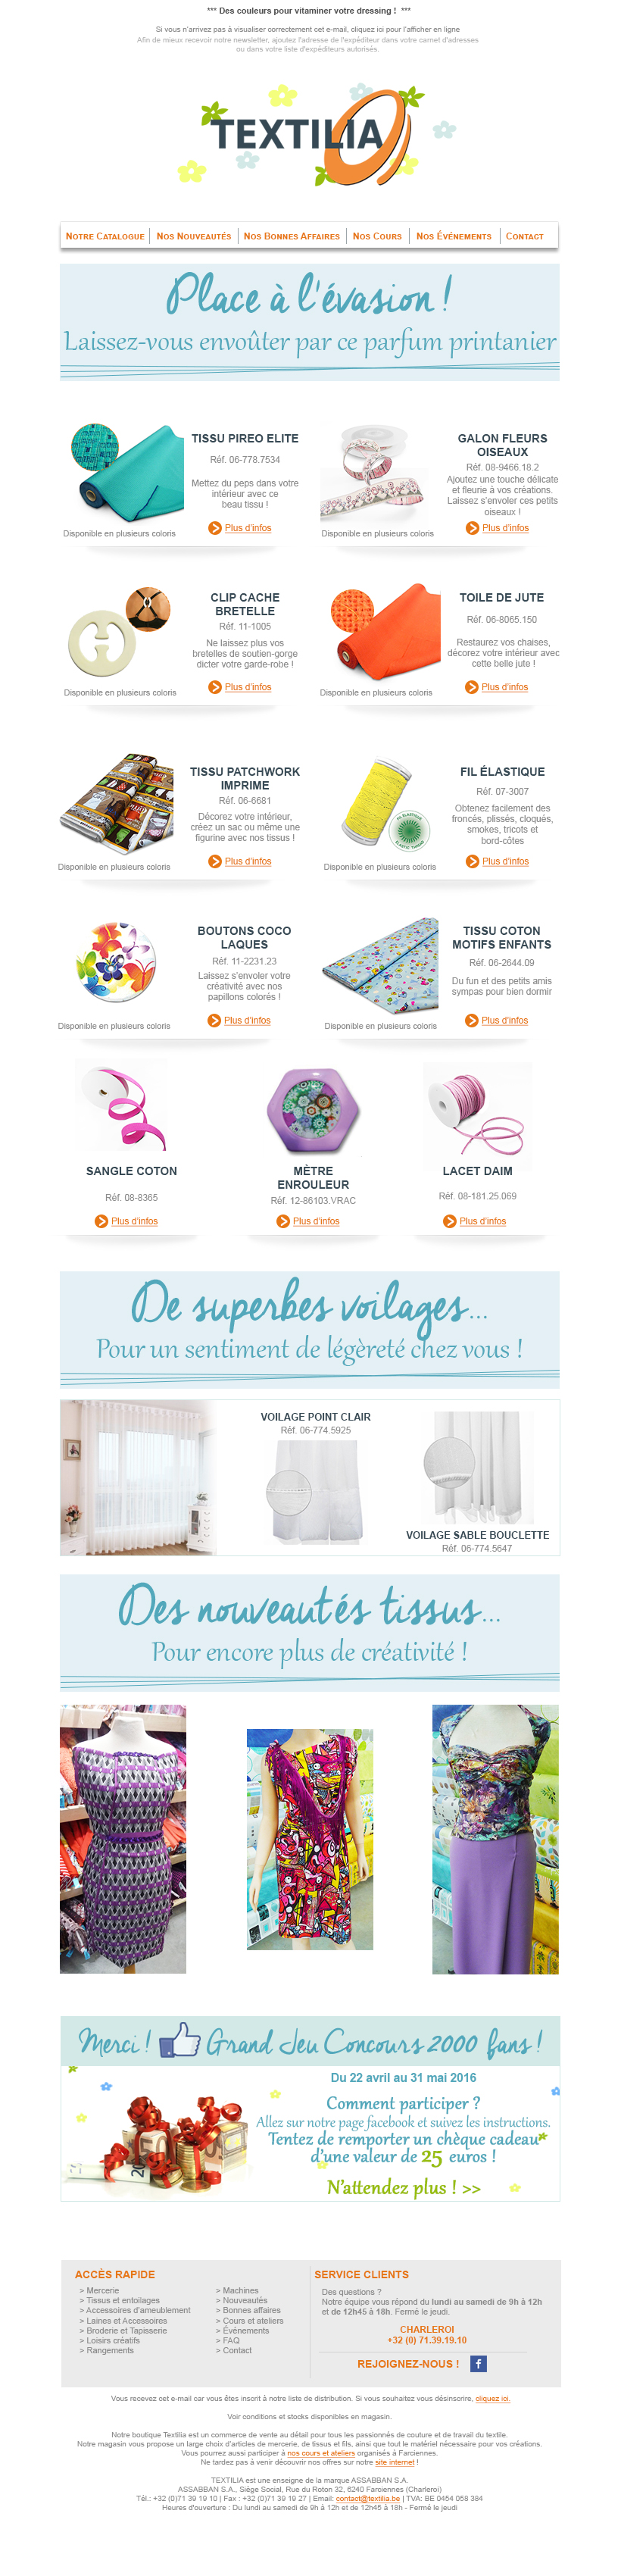 Textilia E-mailing